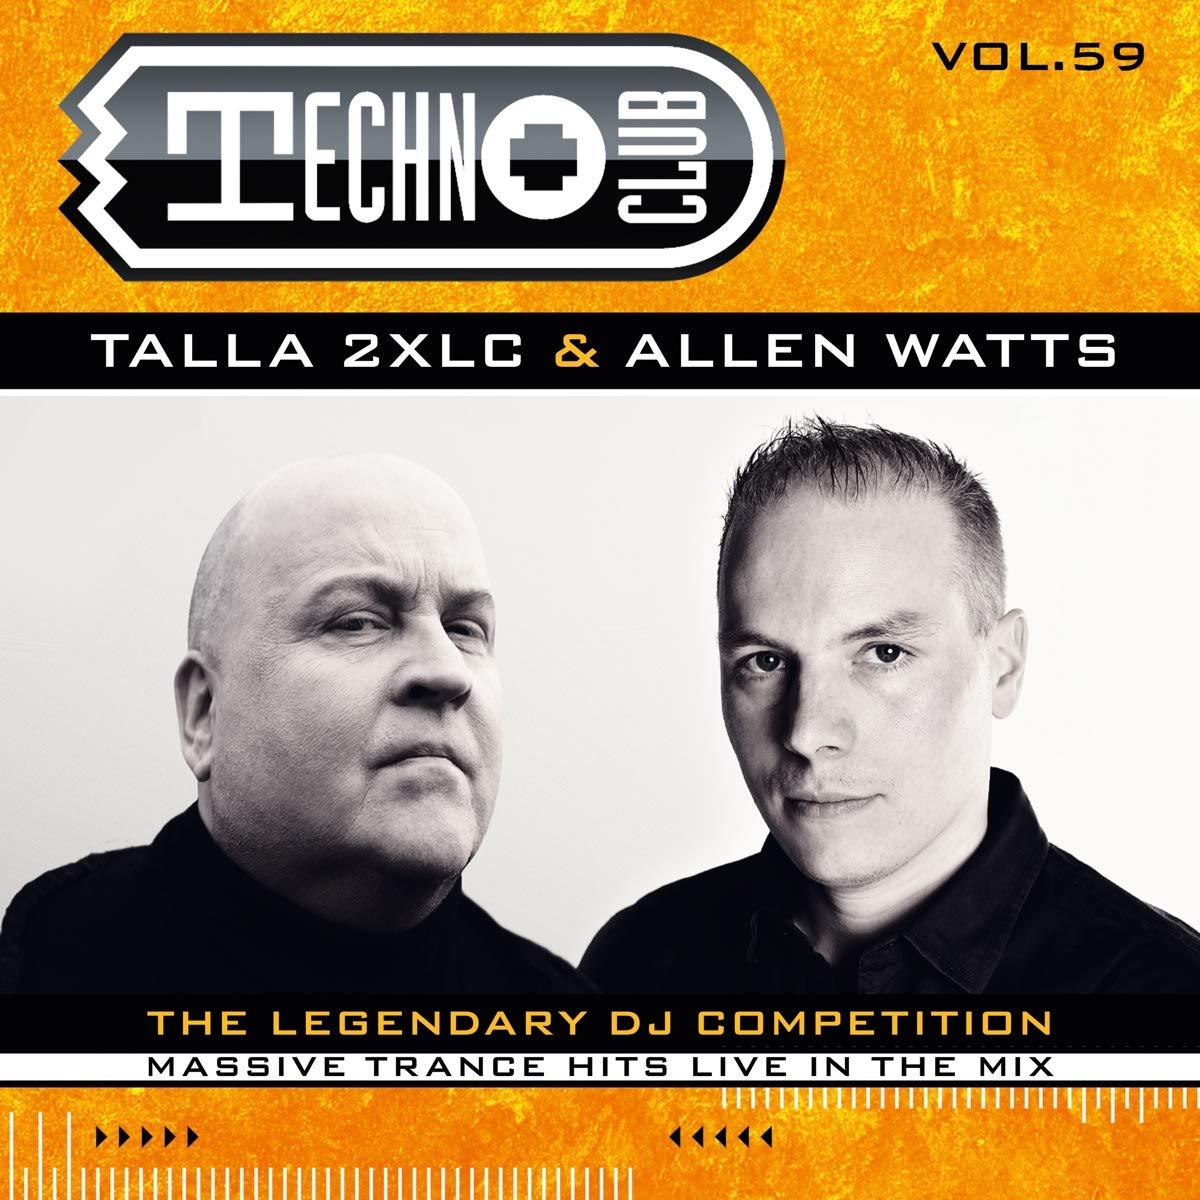 Techno Club 59